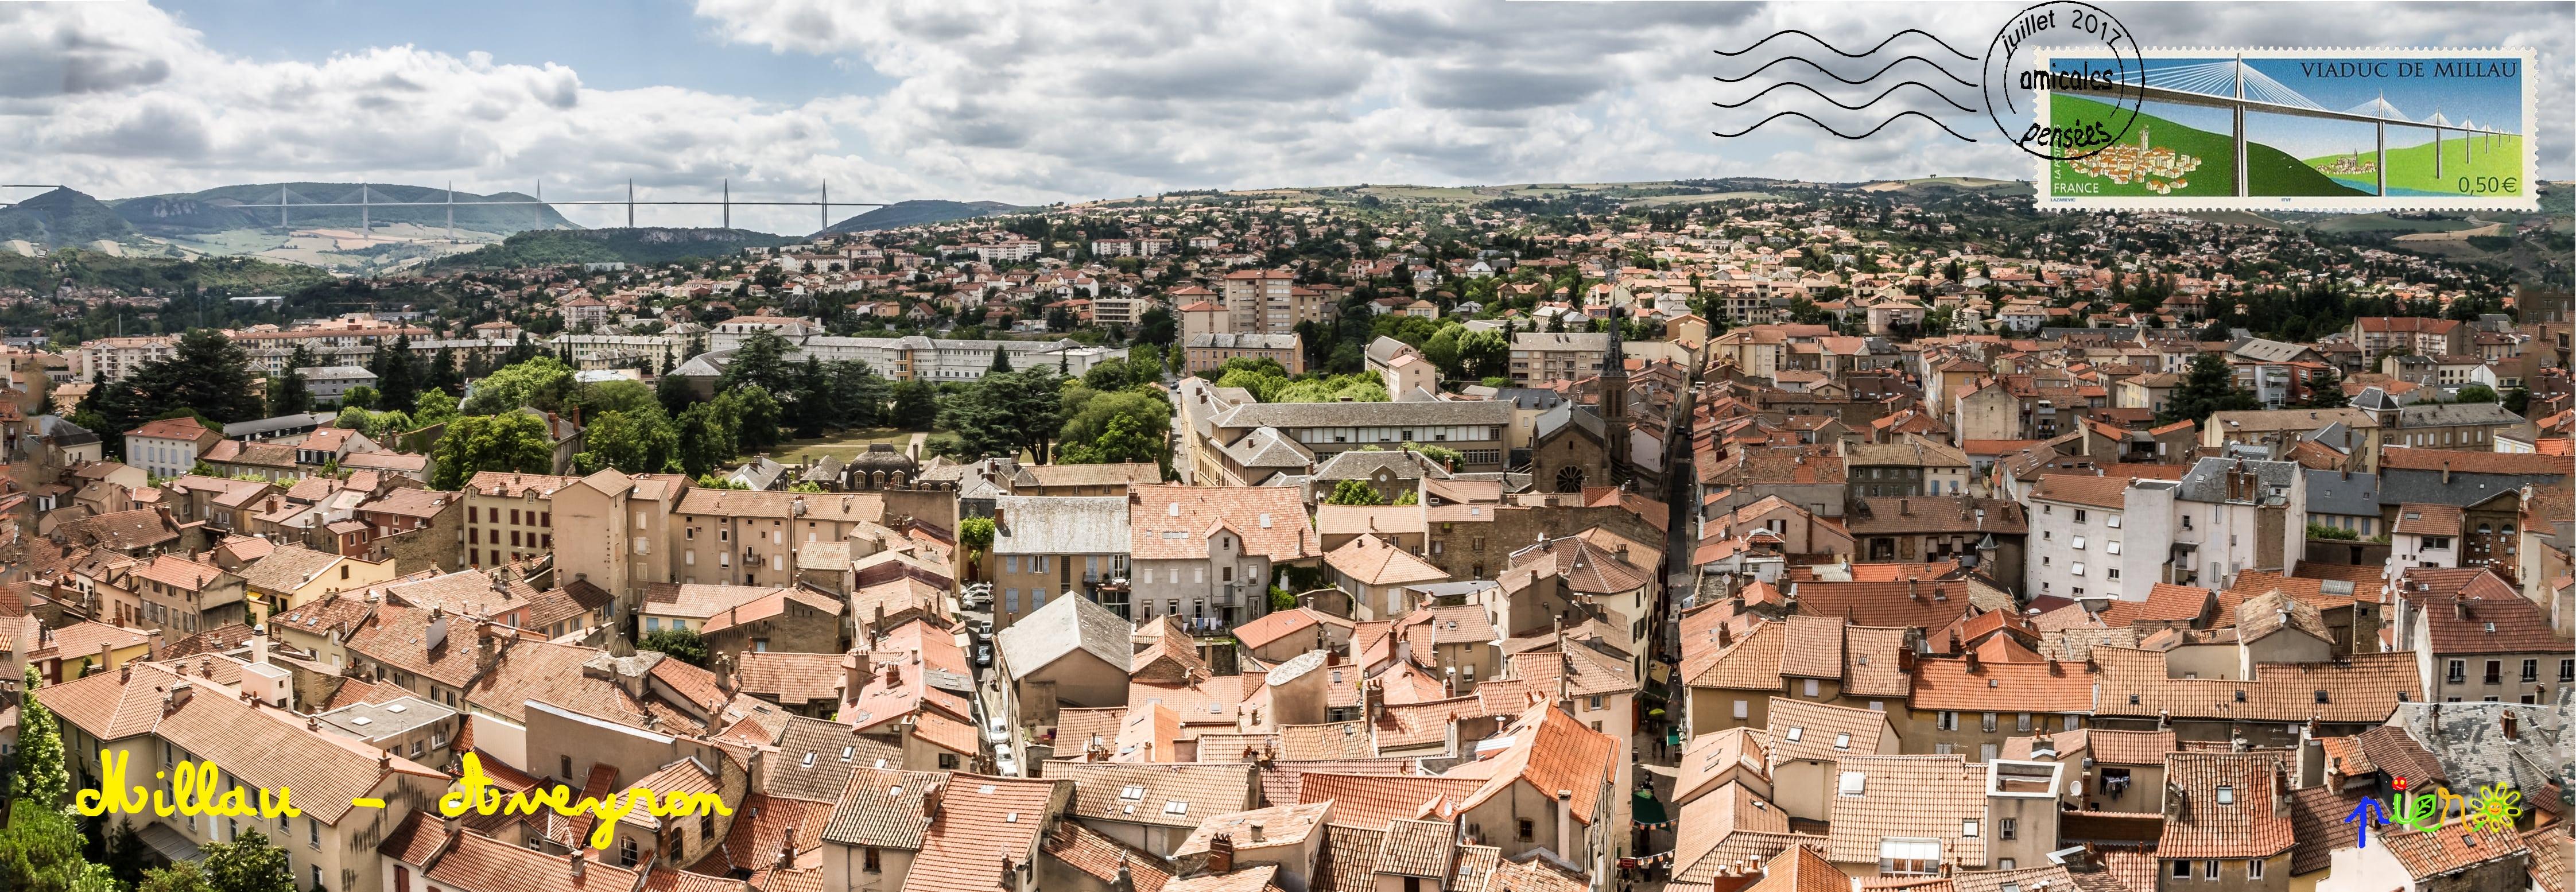 Millau - Aveyron - juillet 2017.